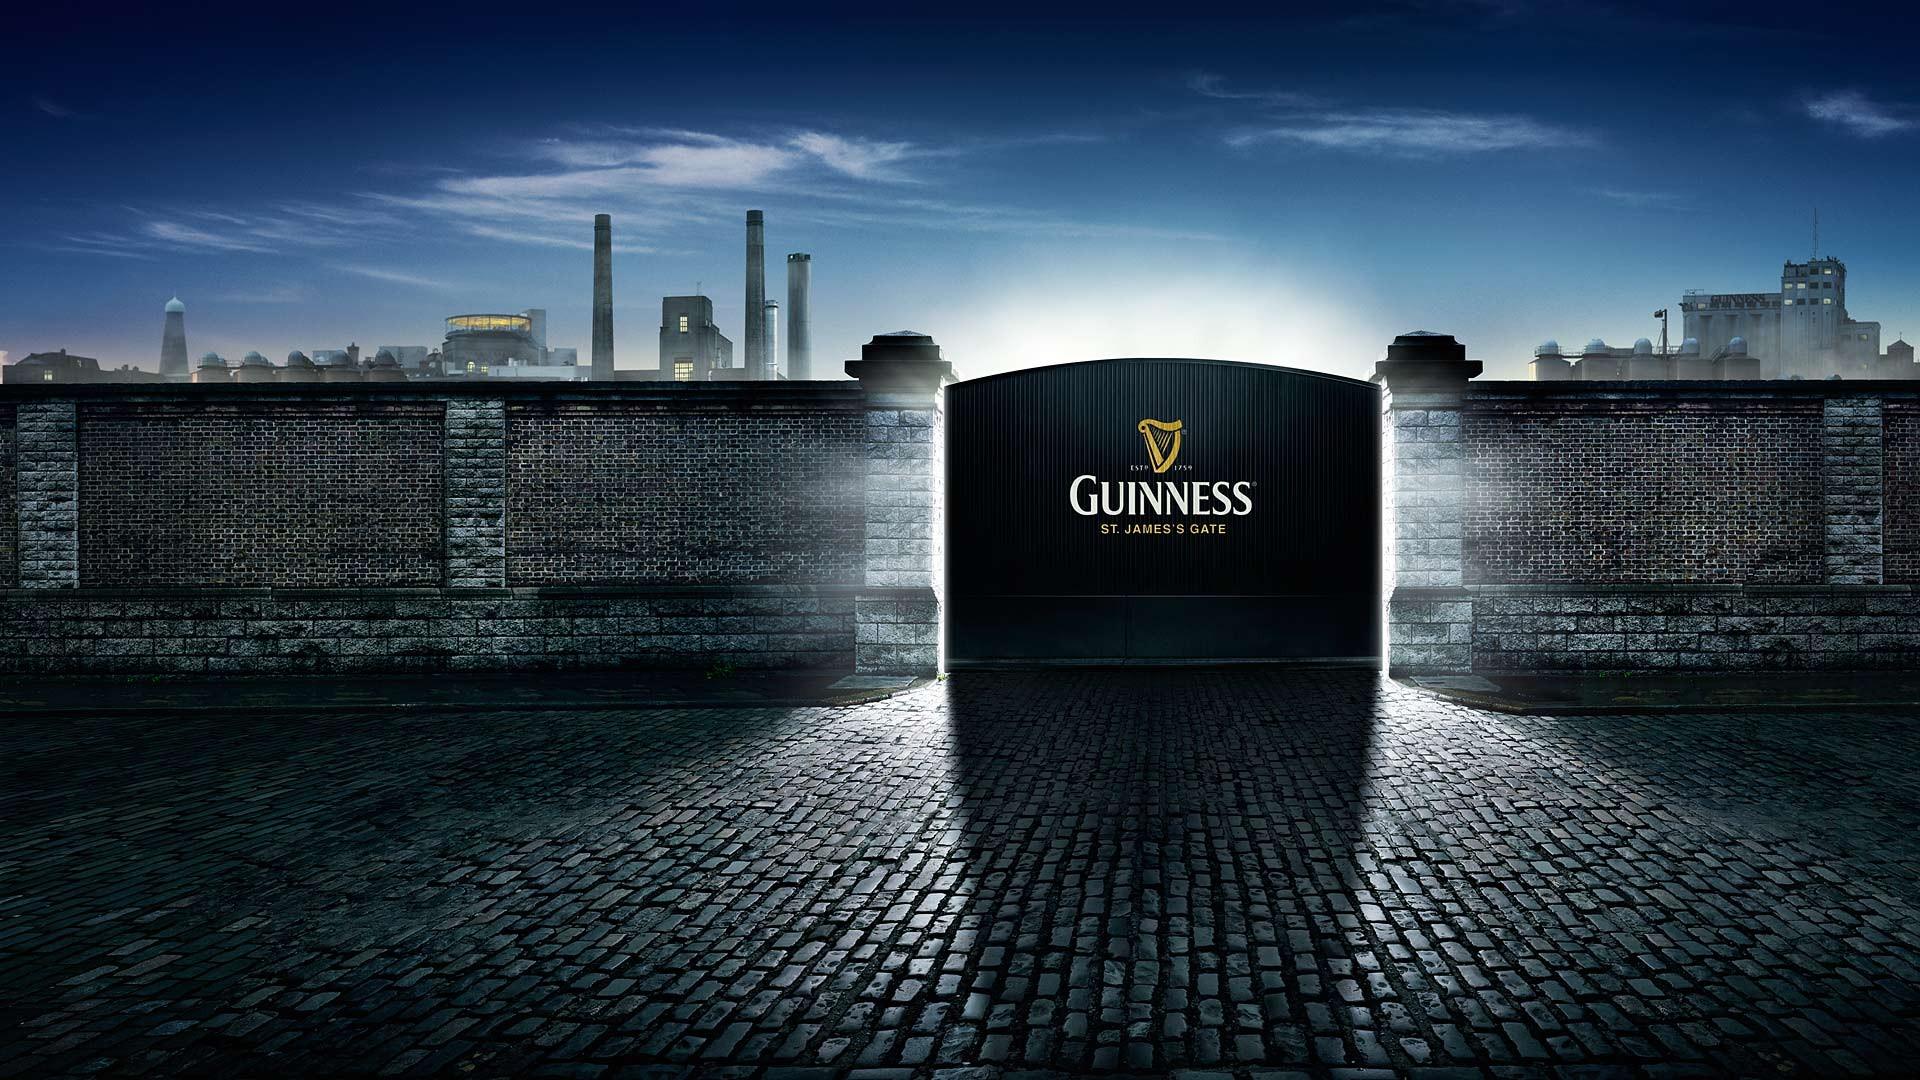 irish beer wallpaper hd - photo #20